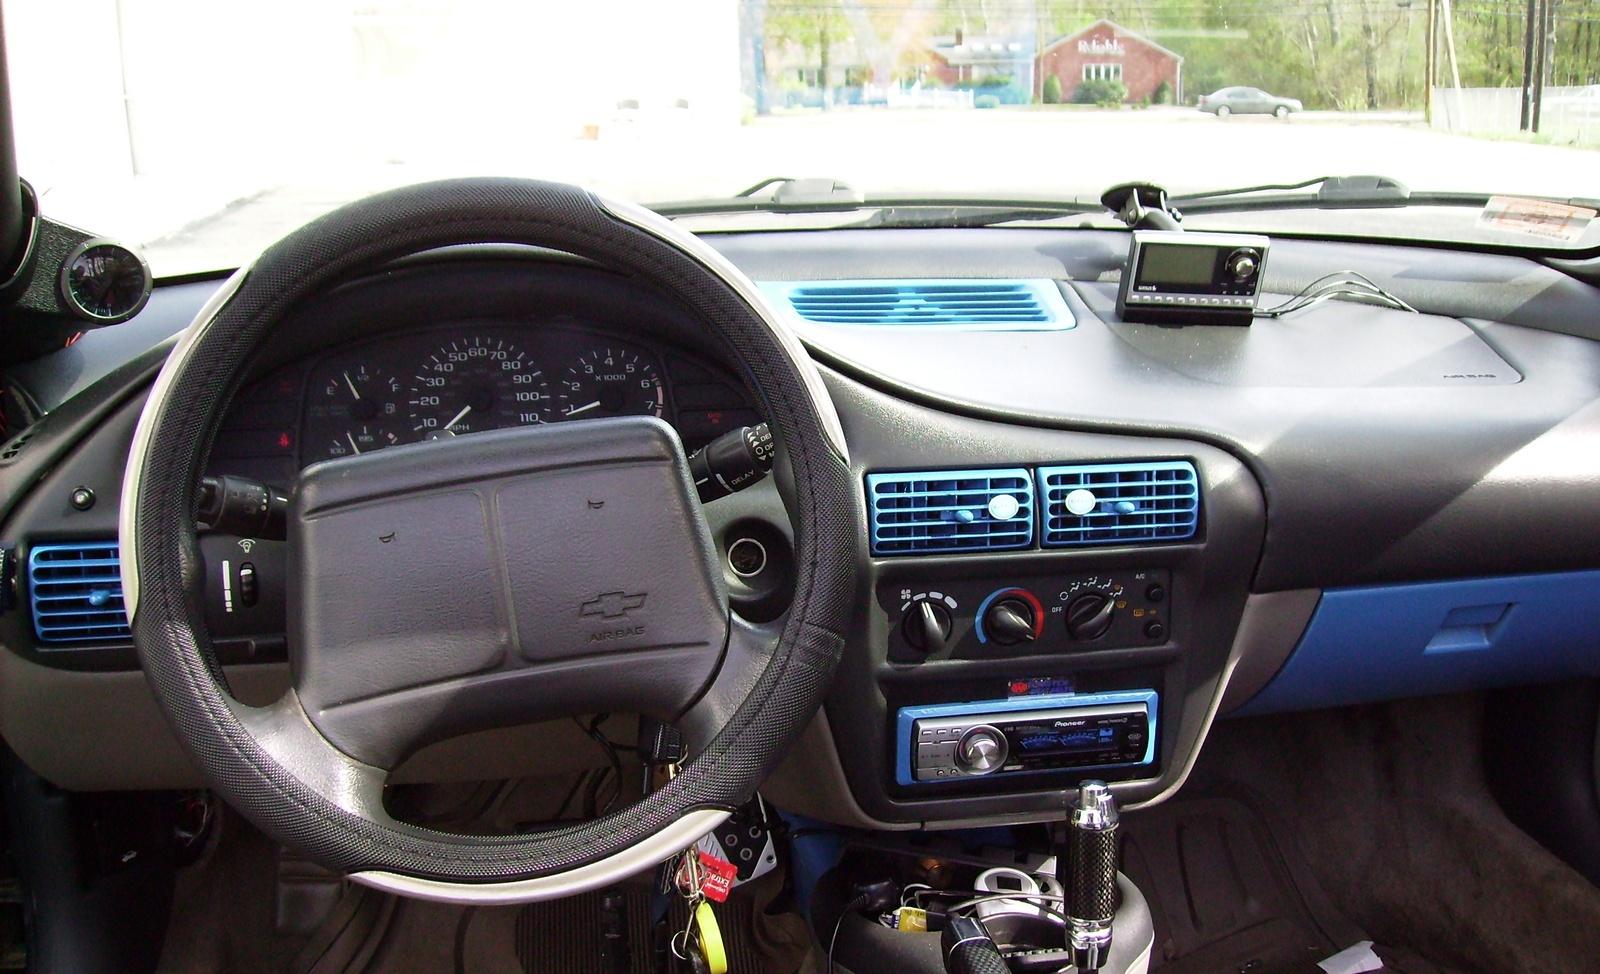 1996 chevrolet cavalier interior pictures cargurus - 2003 chevy cavalier interior parts ...